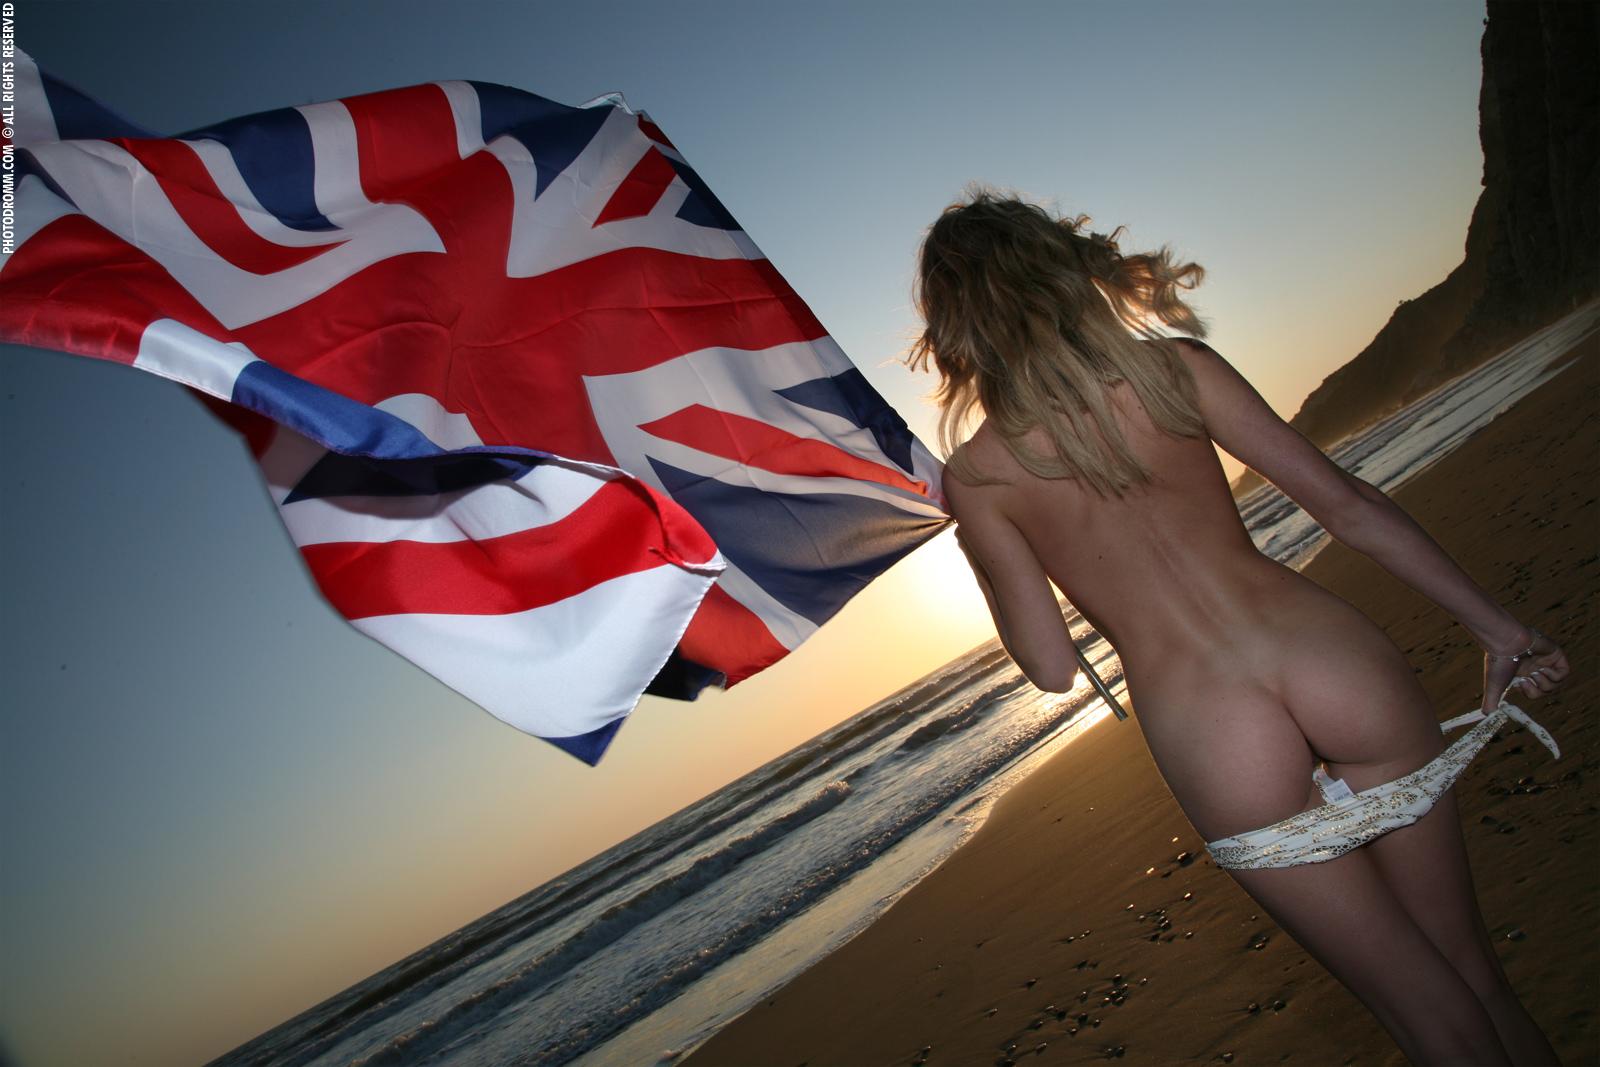 Naked southern flag girls 6